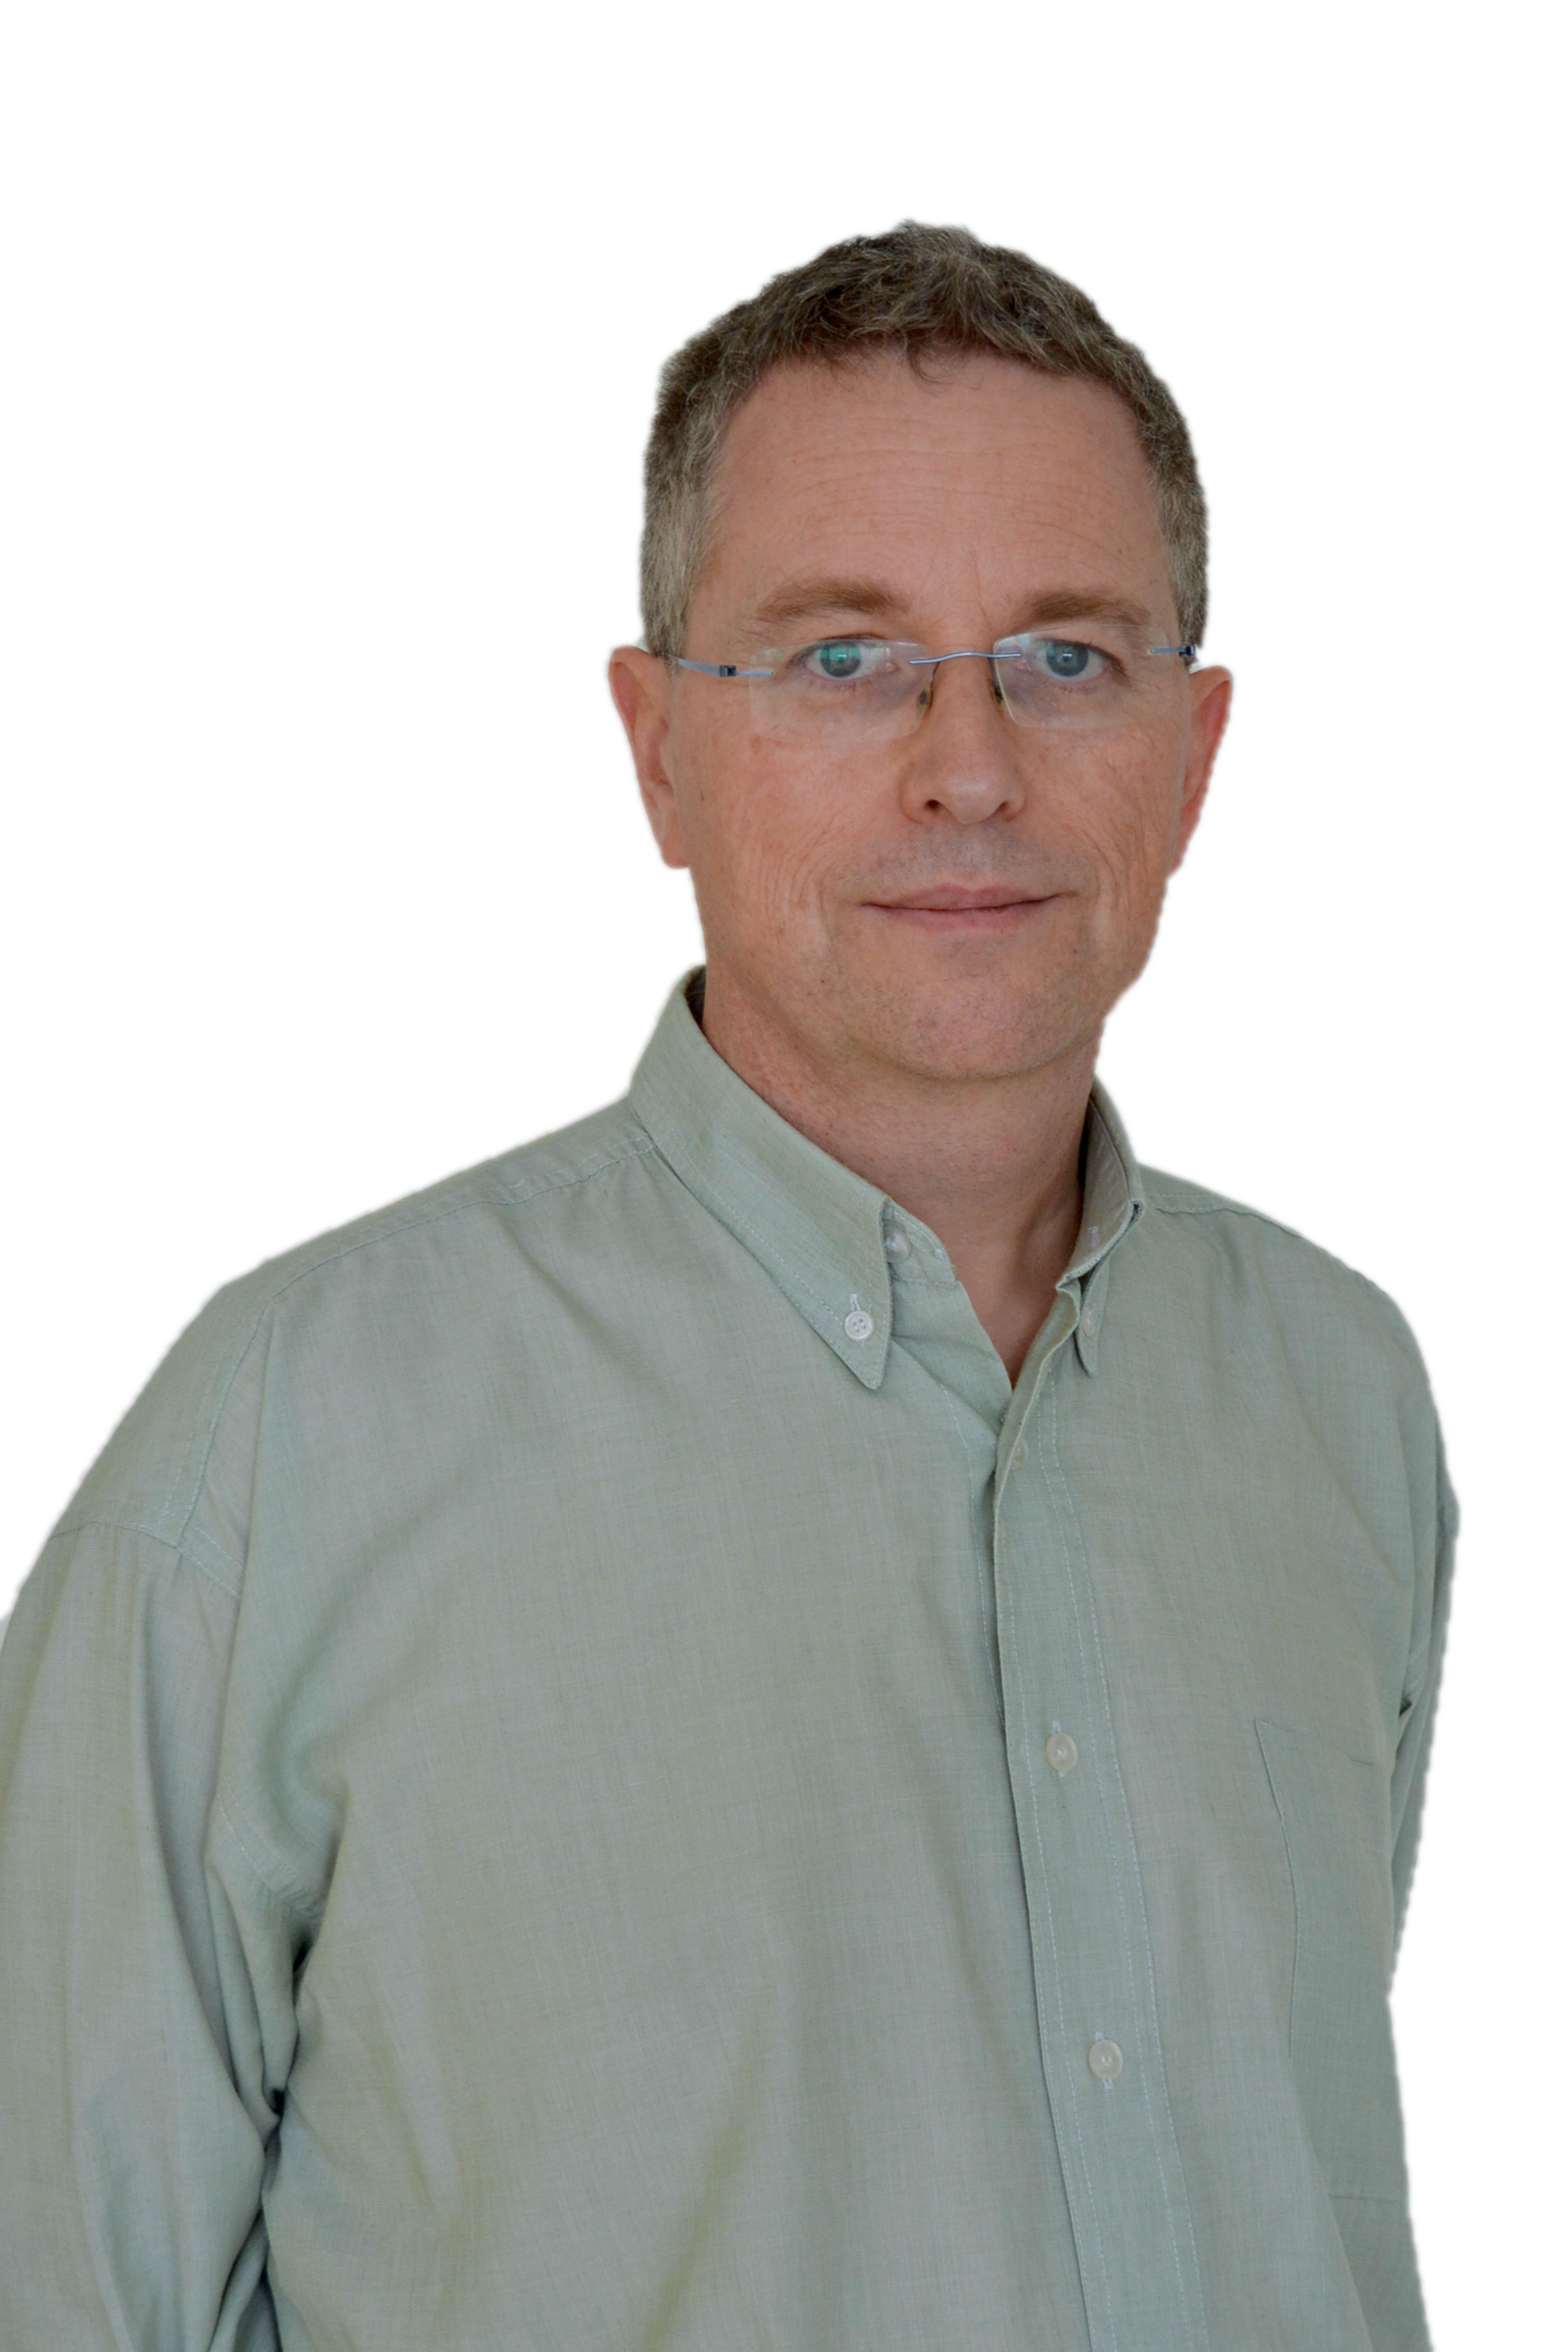 David Aumont